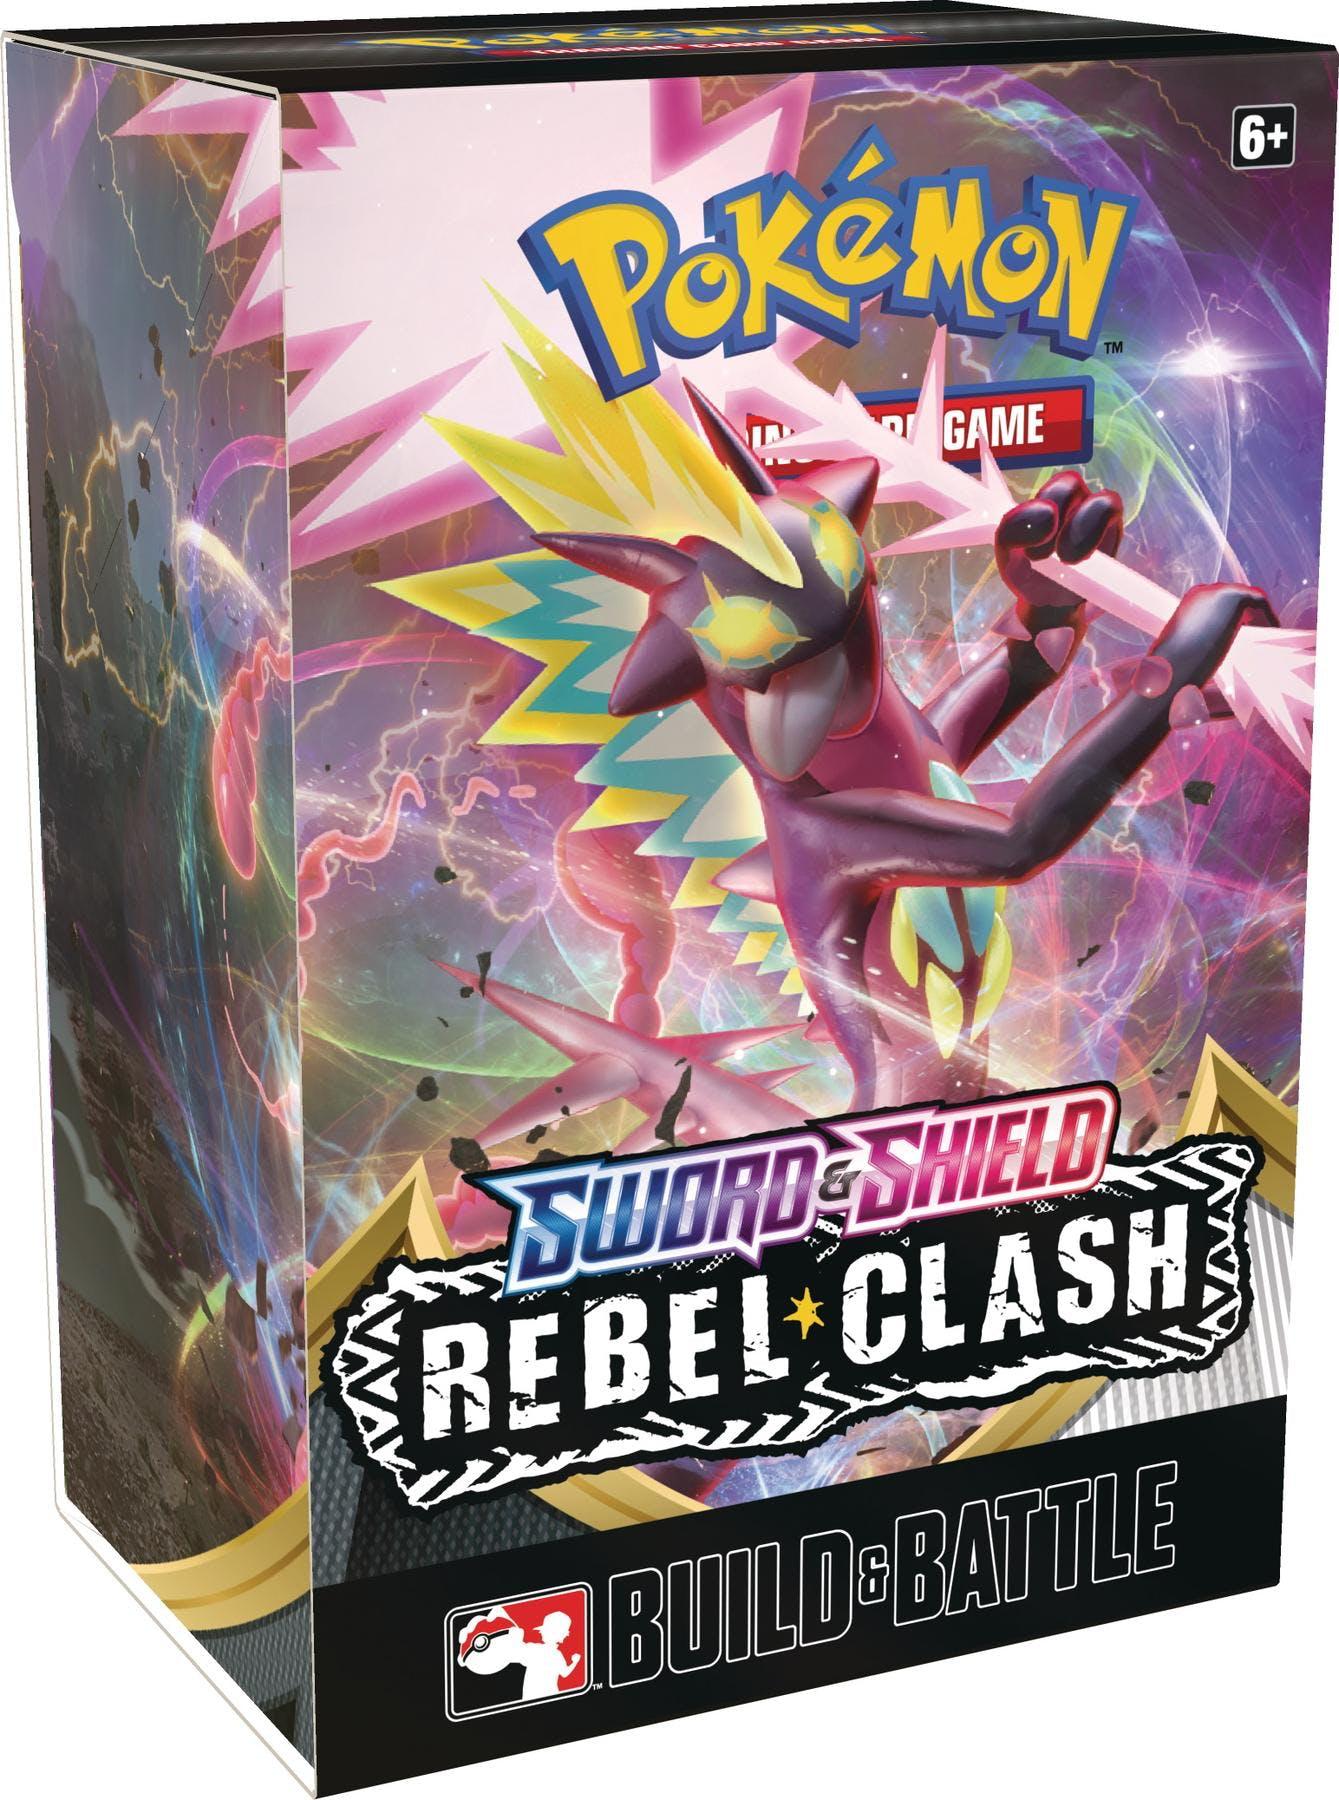 Rebel Clash Build and Battle Box (plus three Rebel Clash booster packs!)